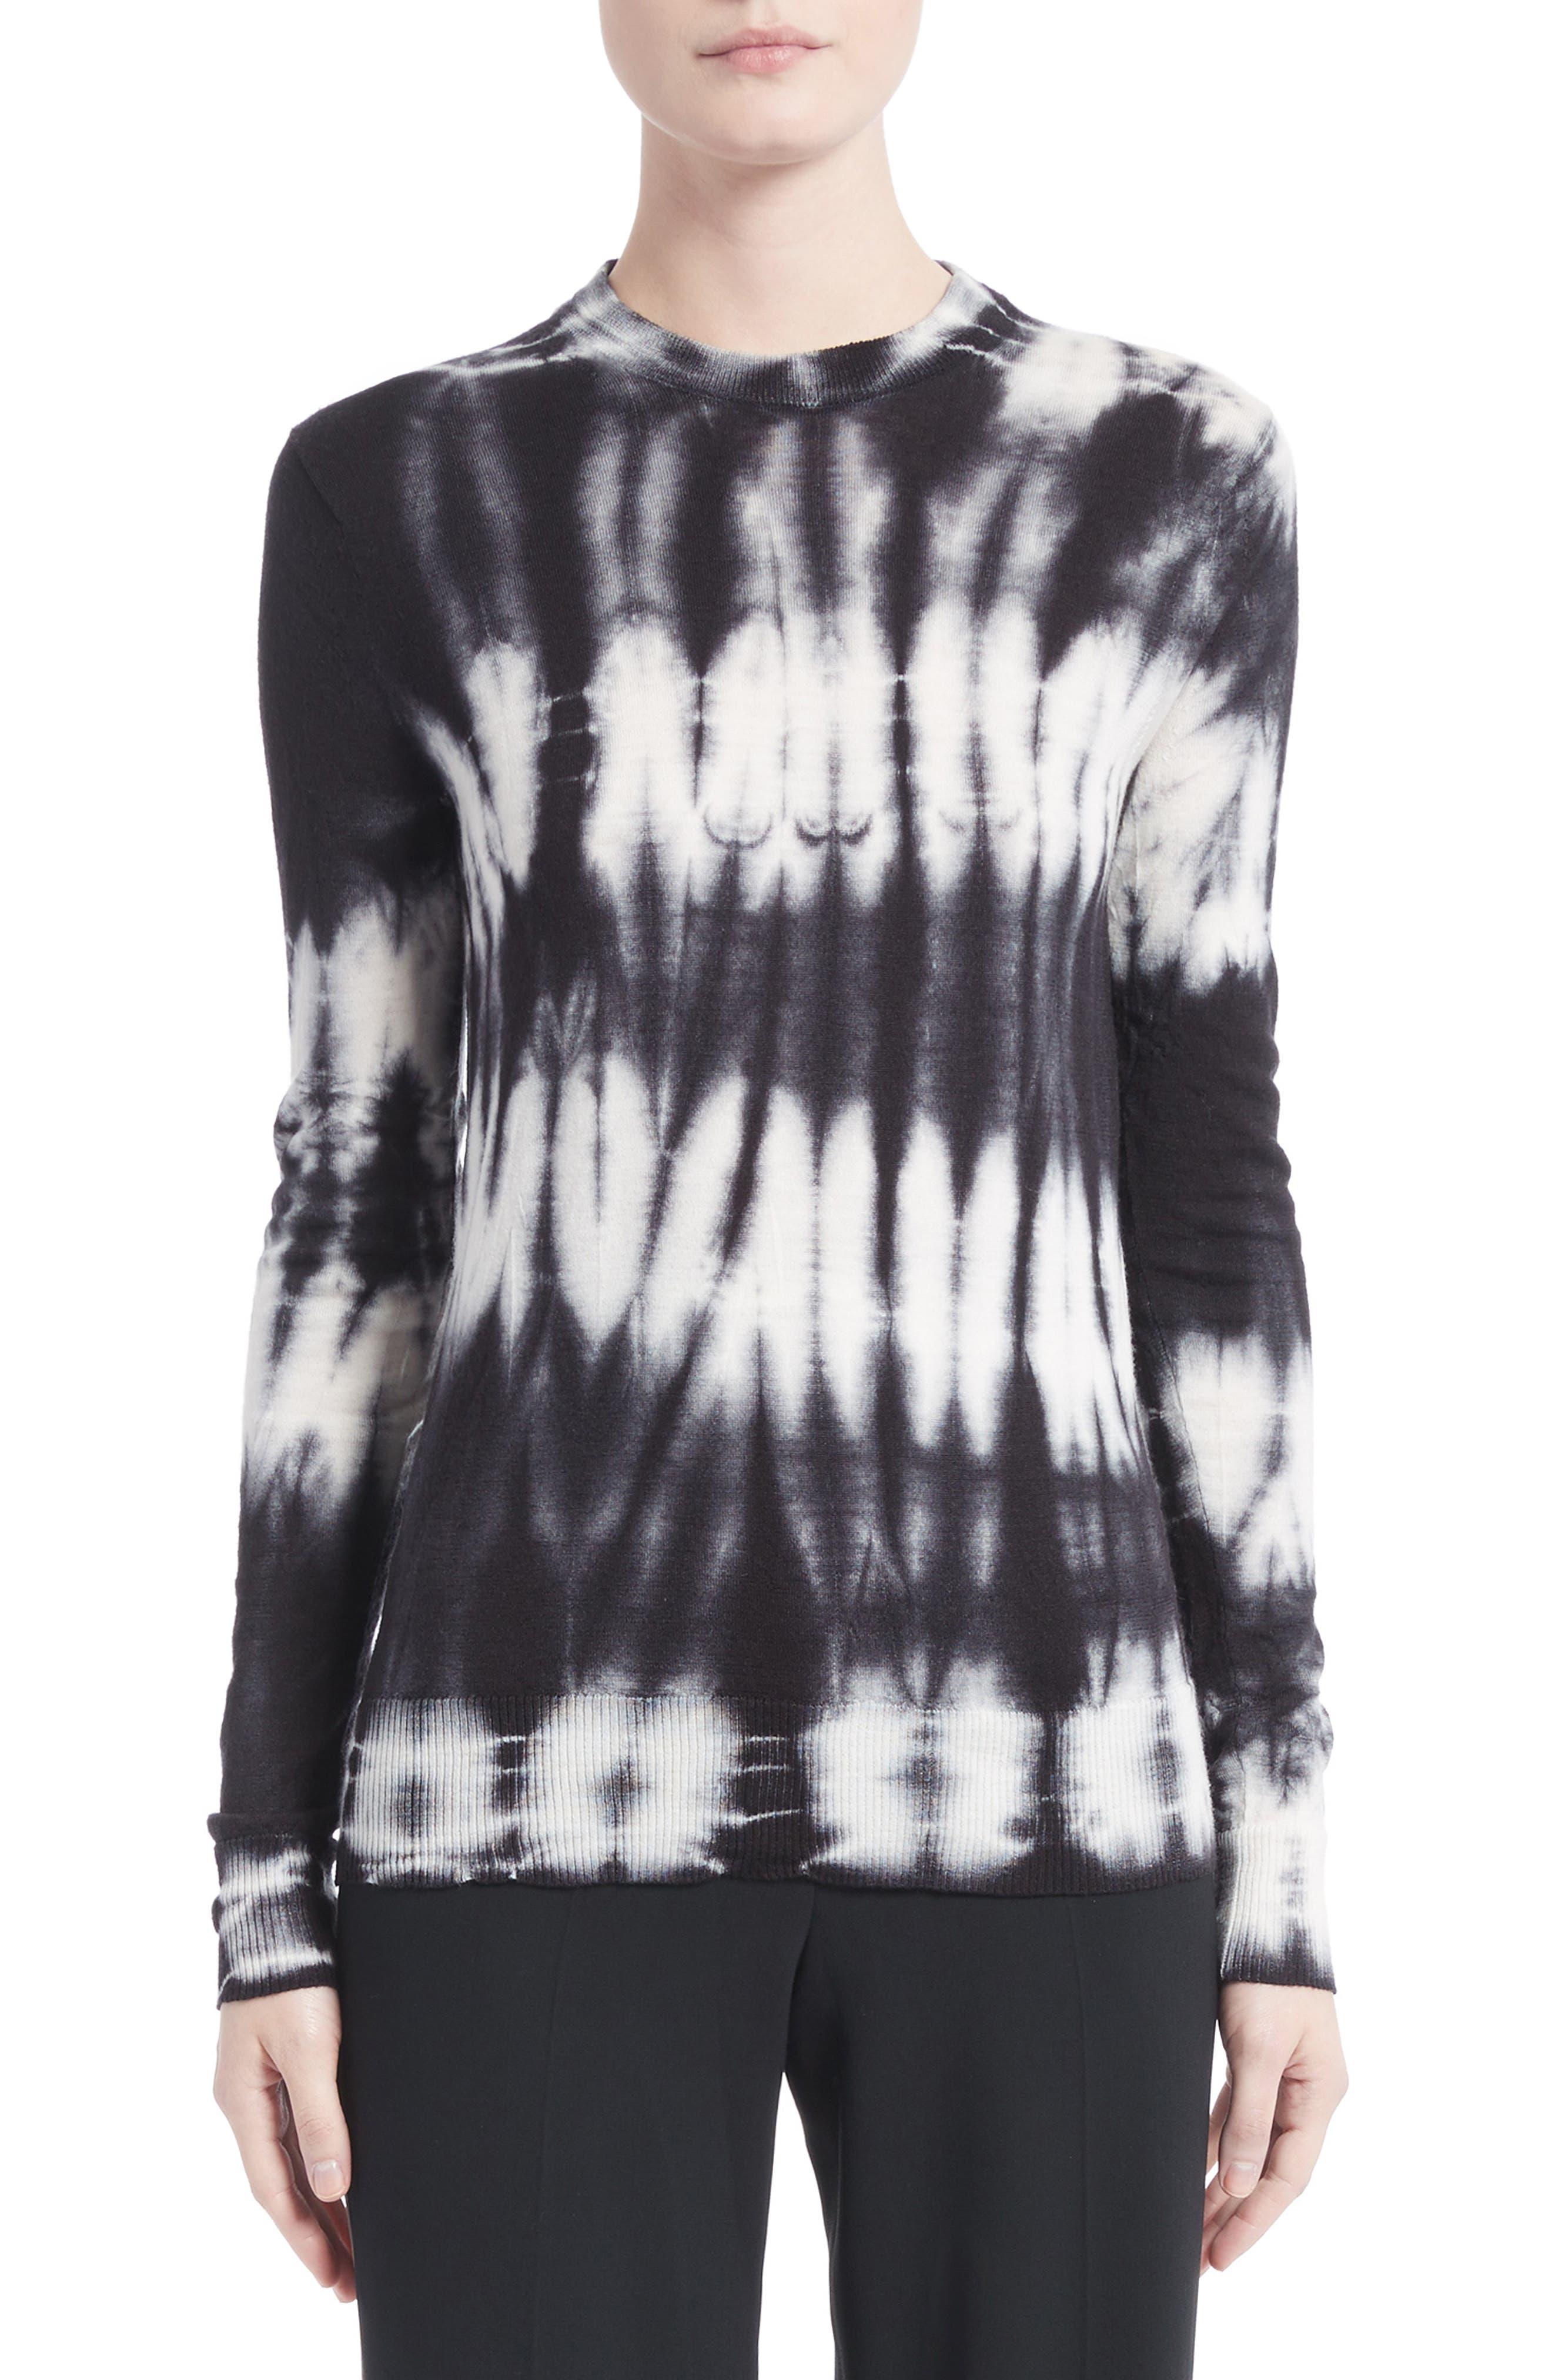 Main Image - Proenza Schouler Tie Dye Wool Sweater